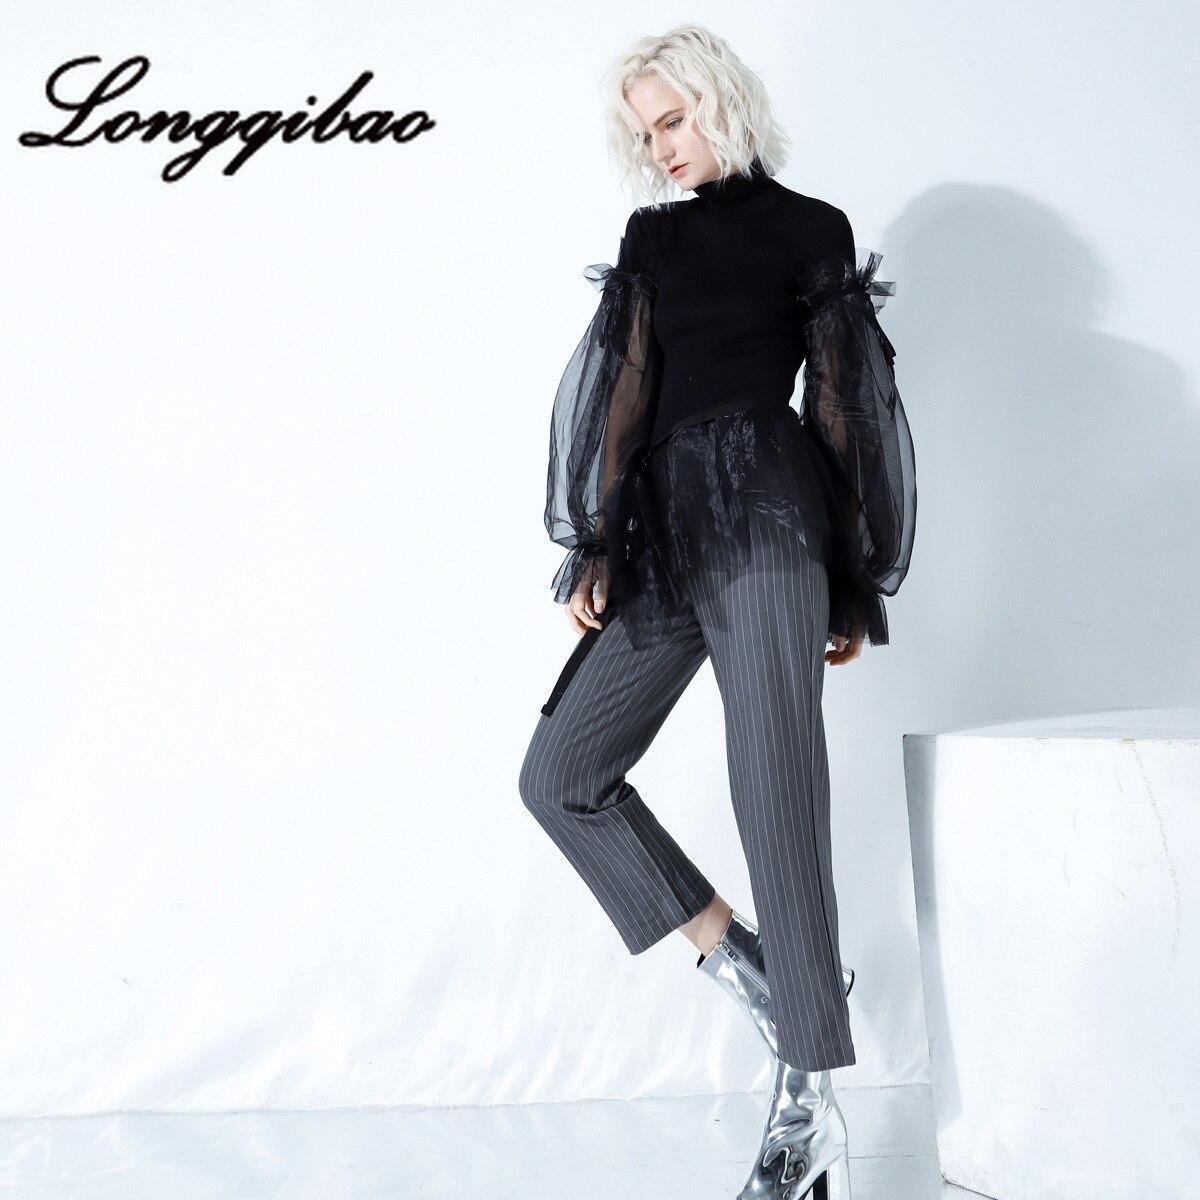 Longqibao Women's Clothing Stand Collar Knit Splicing Organza Perspective Fluffy Sleeve Hem Ruffle Fashion Personality Sweater